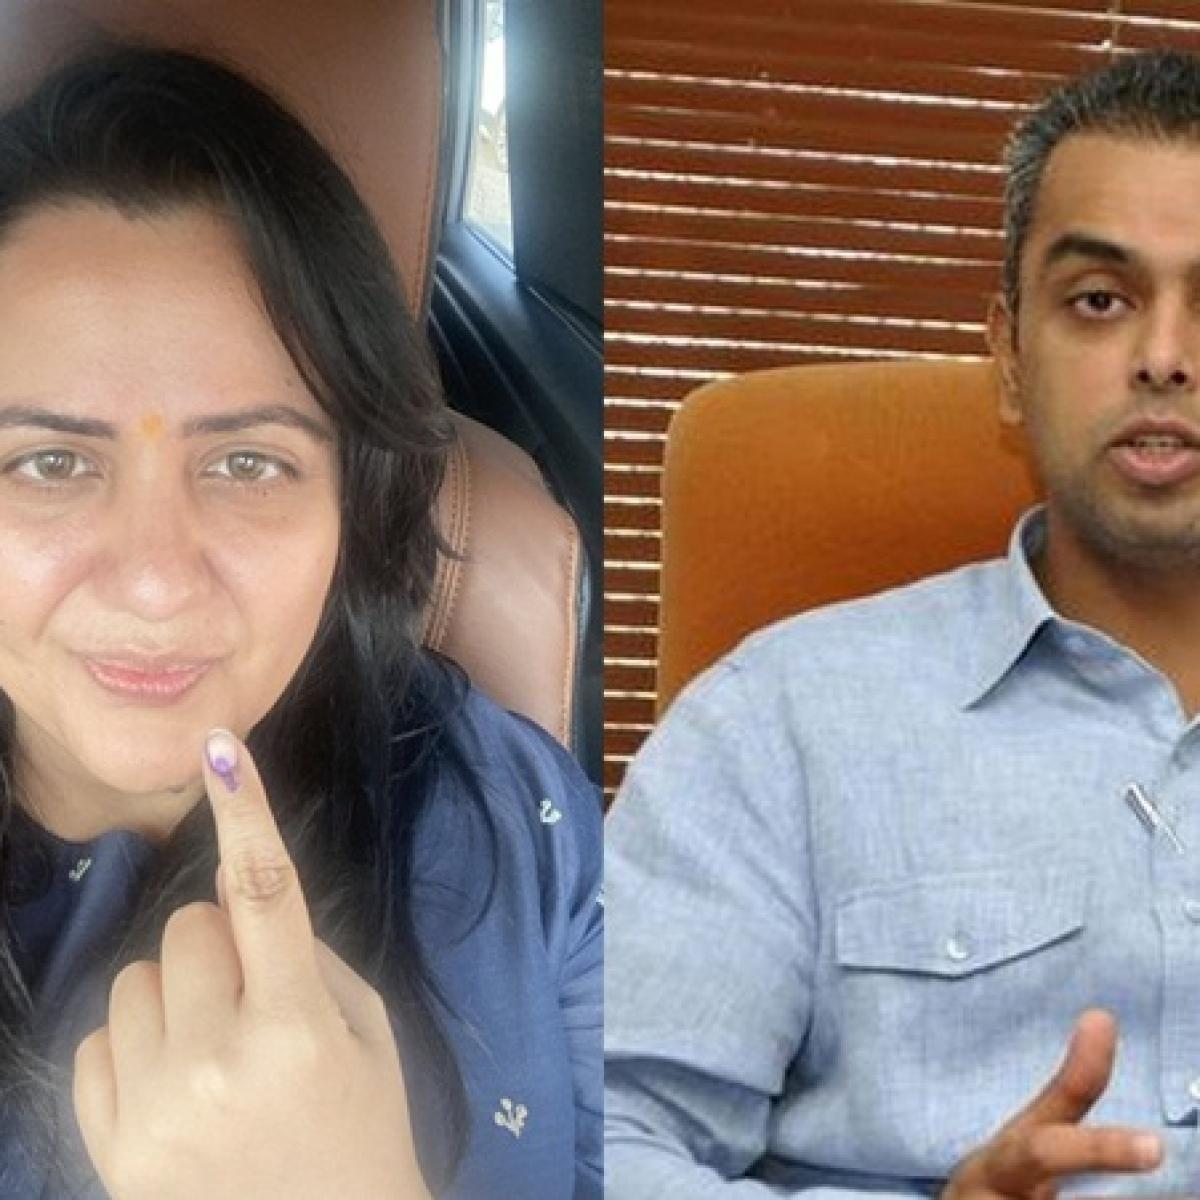 Kejriwal's 70% corona tax: Radhika Khera disagrees with Milind Deora's 'prudent Delhi government' claim